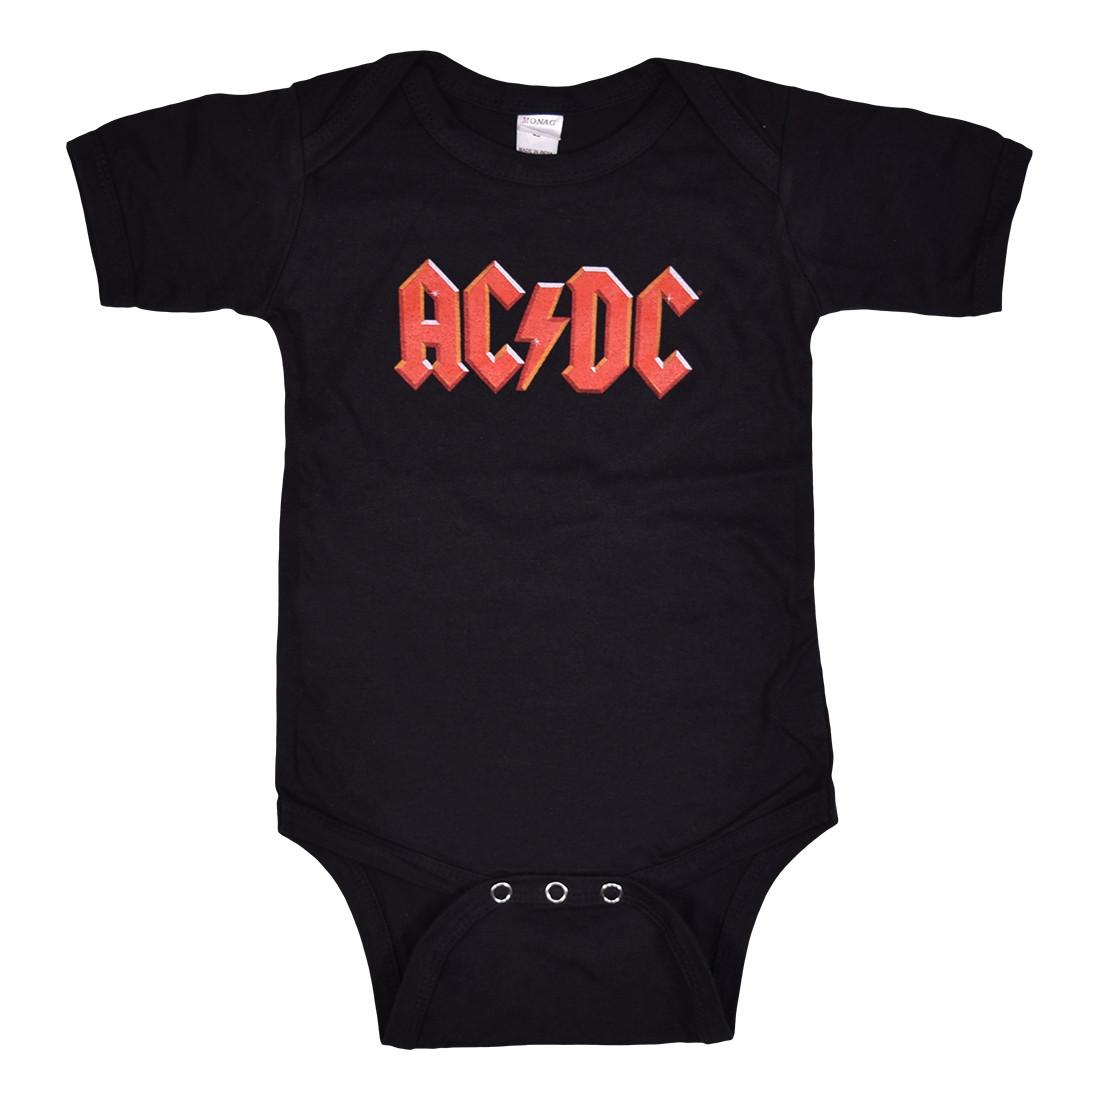 AC/DC Logo Black Onesie Clearance 30% OFF